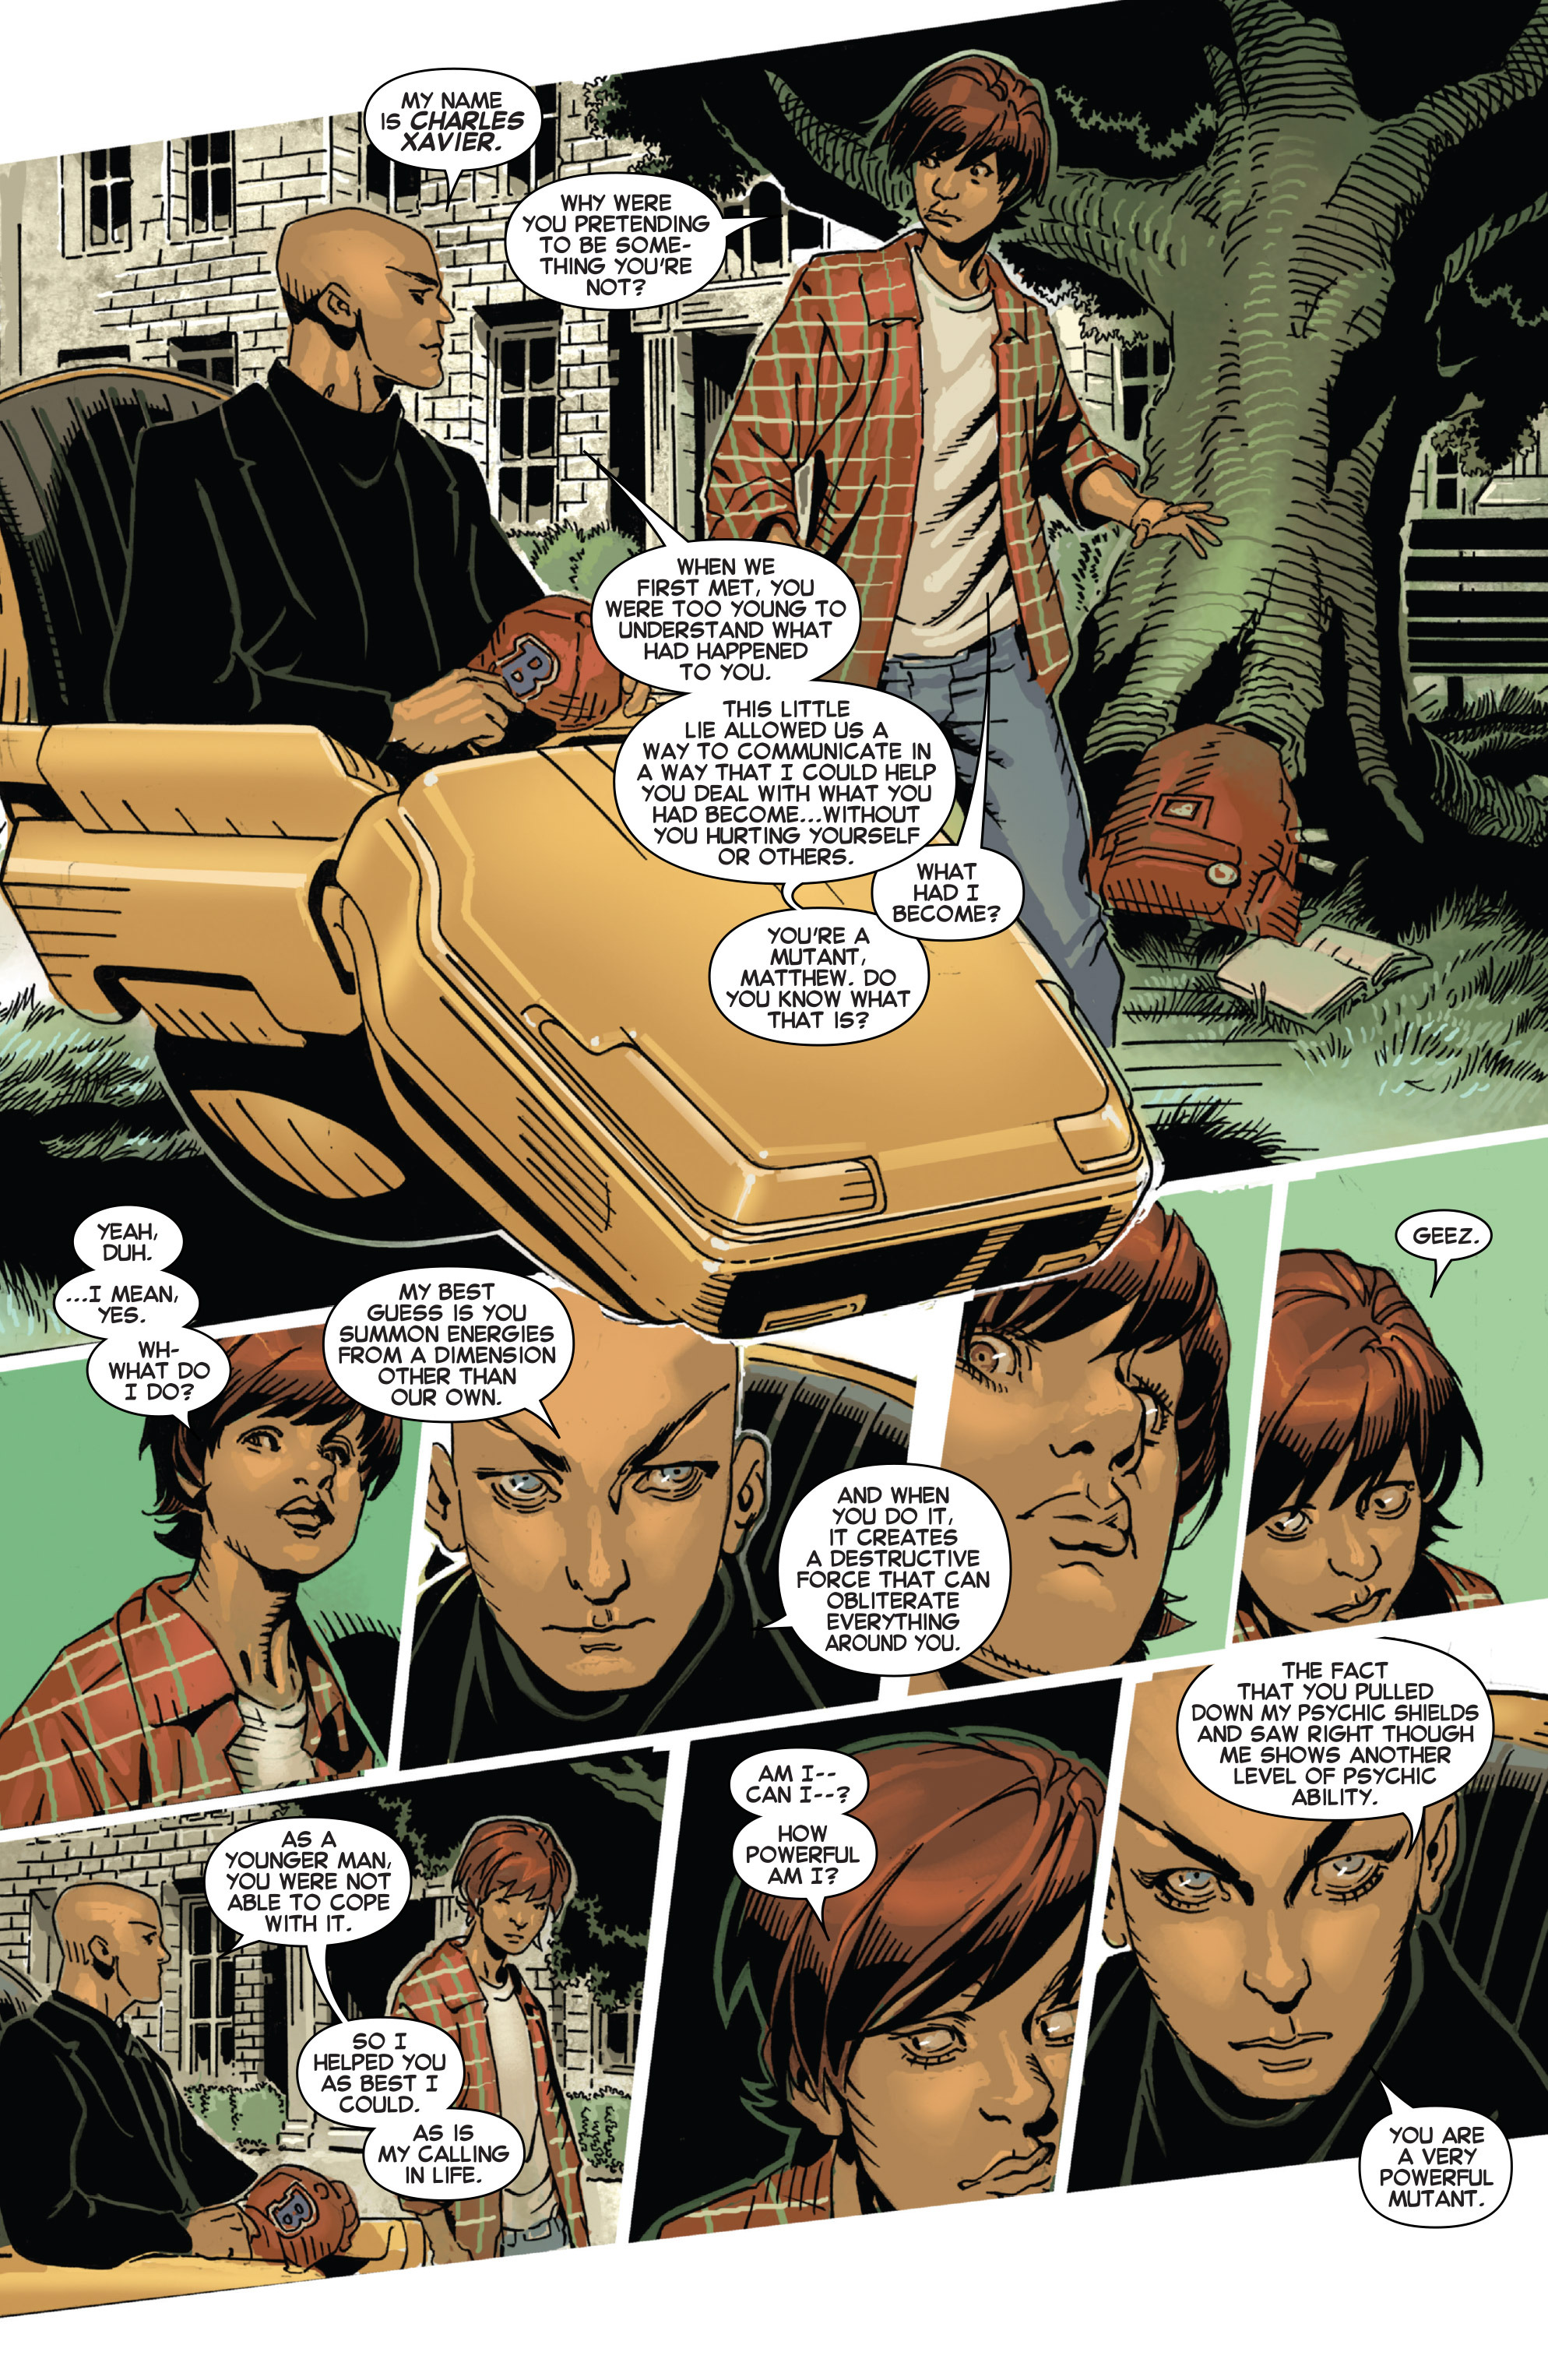 Read online Uncanny X-Men (2013) comic -  Issue # _TPB 4 - vs. S.H.I.E.L.D - 138